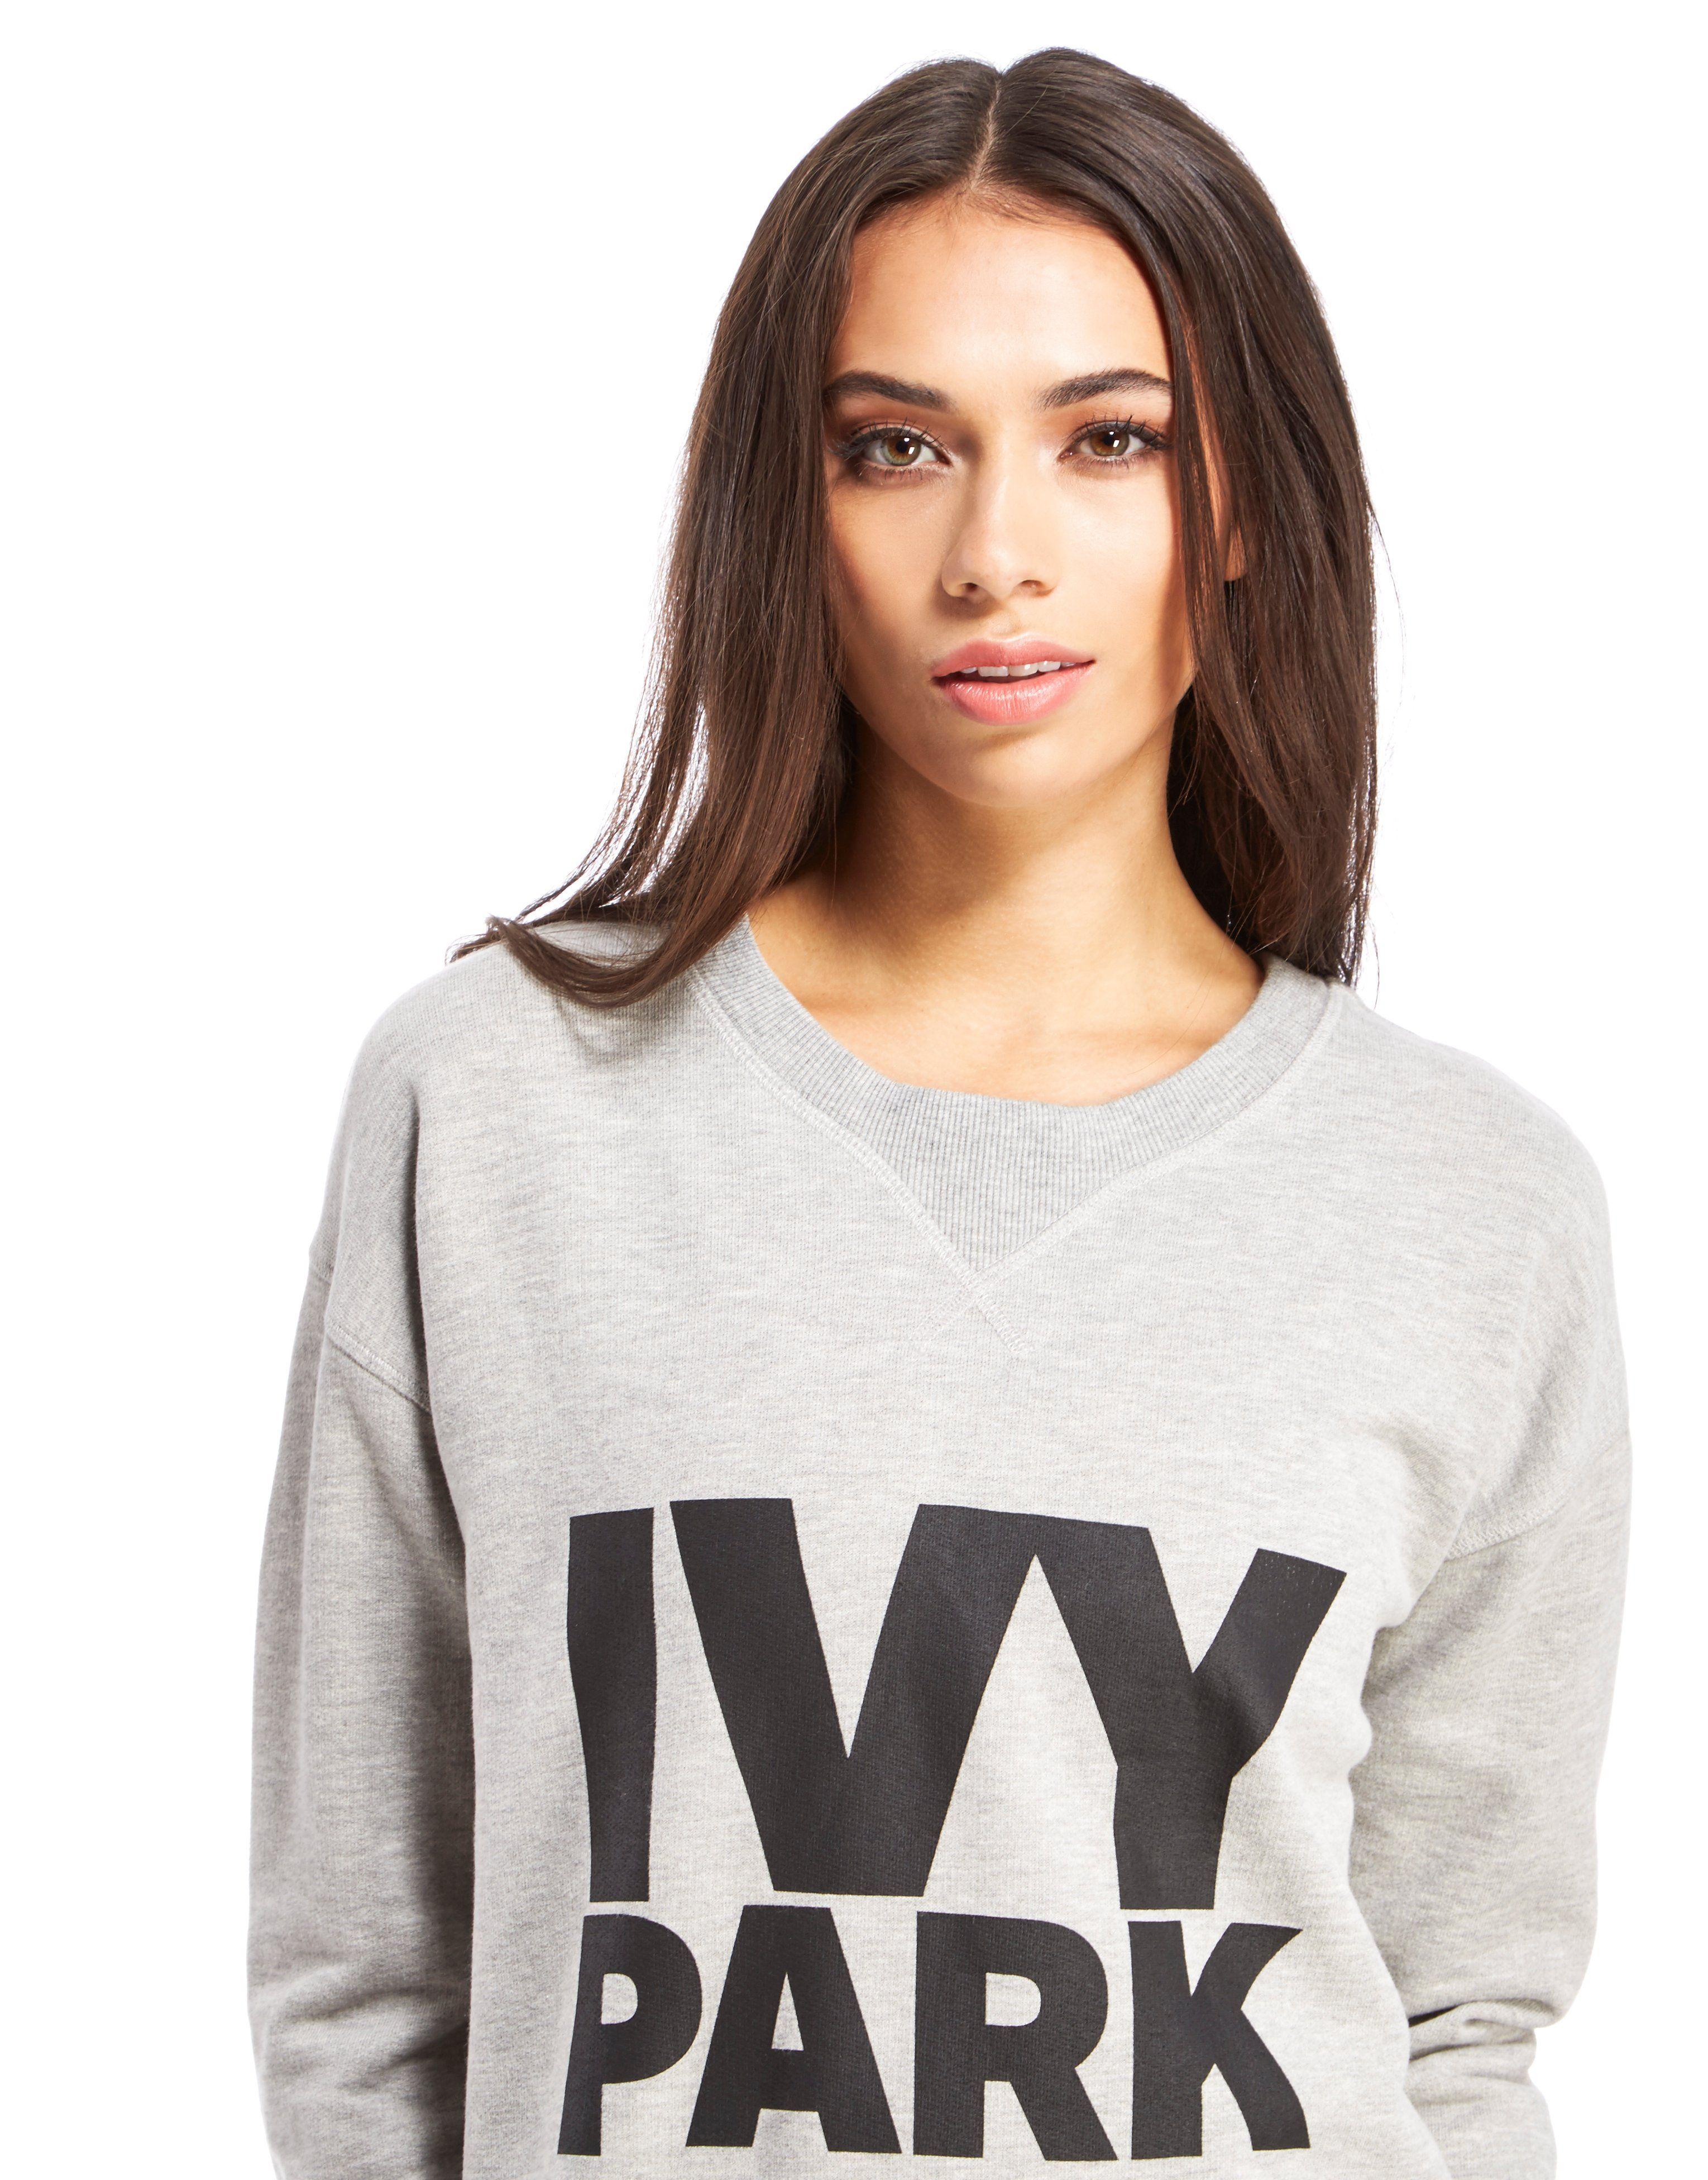 IVY PARK Crew Sweatshirt